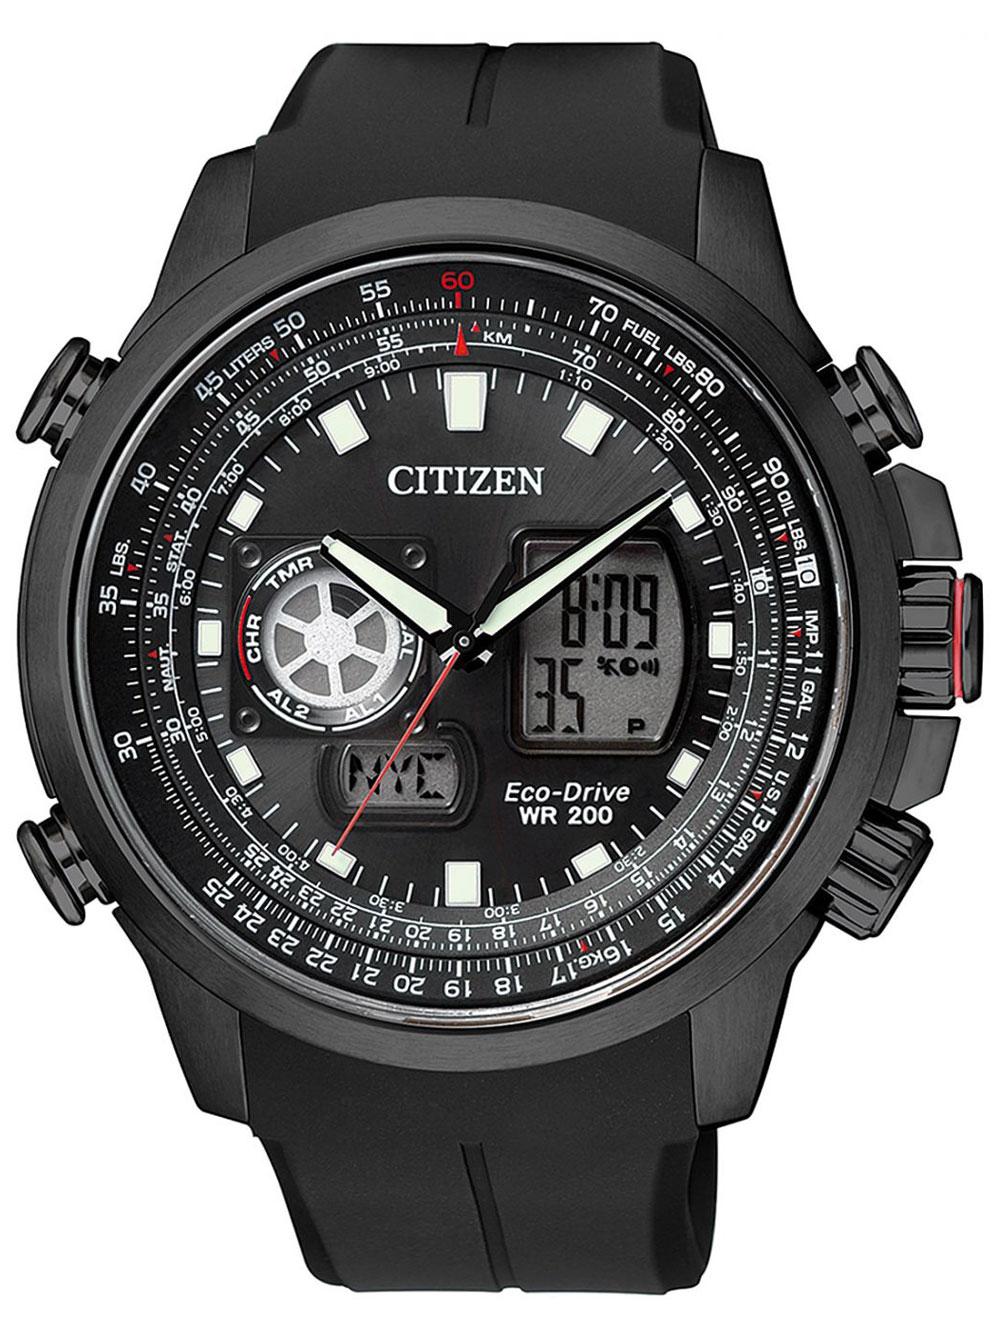 Citizen JZ1065-05E Eco-Drive Promaster-Sky Ana-Digi 46mm 200M